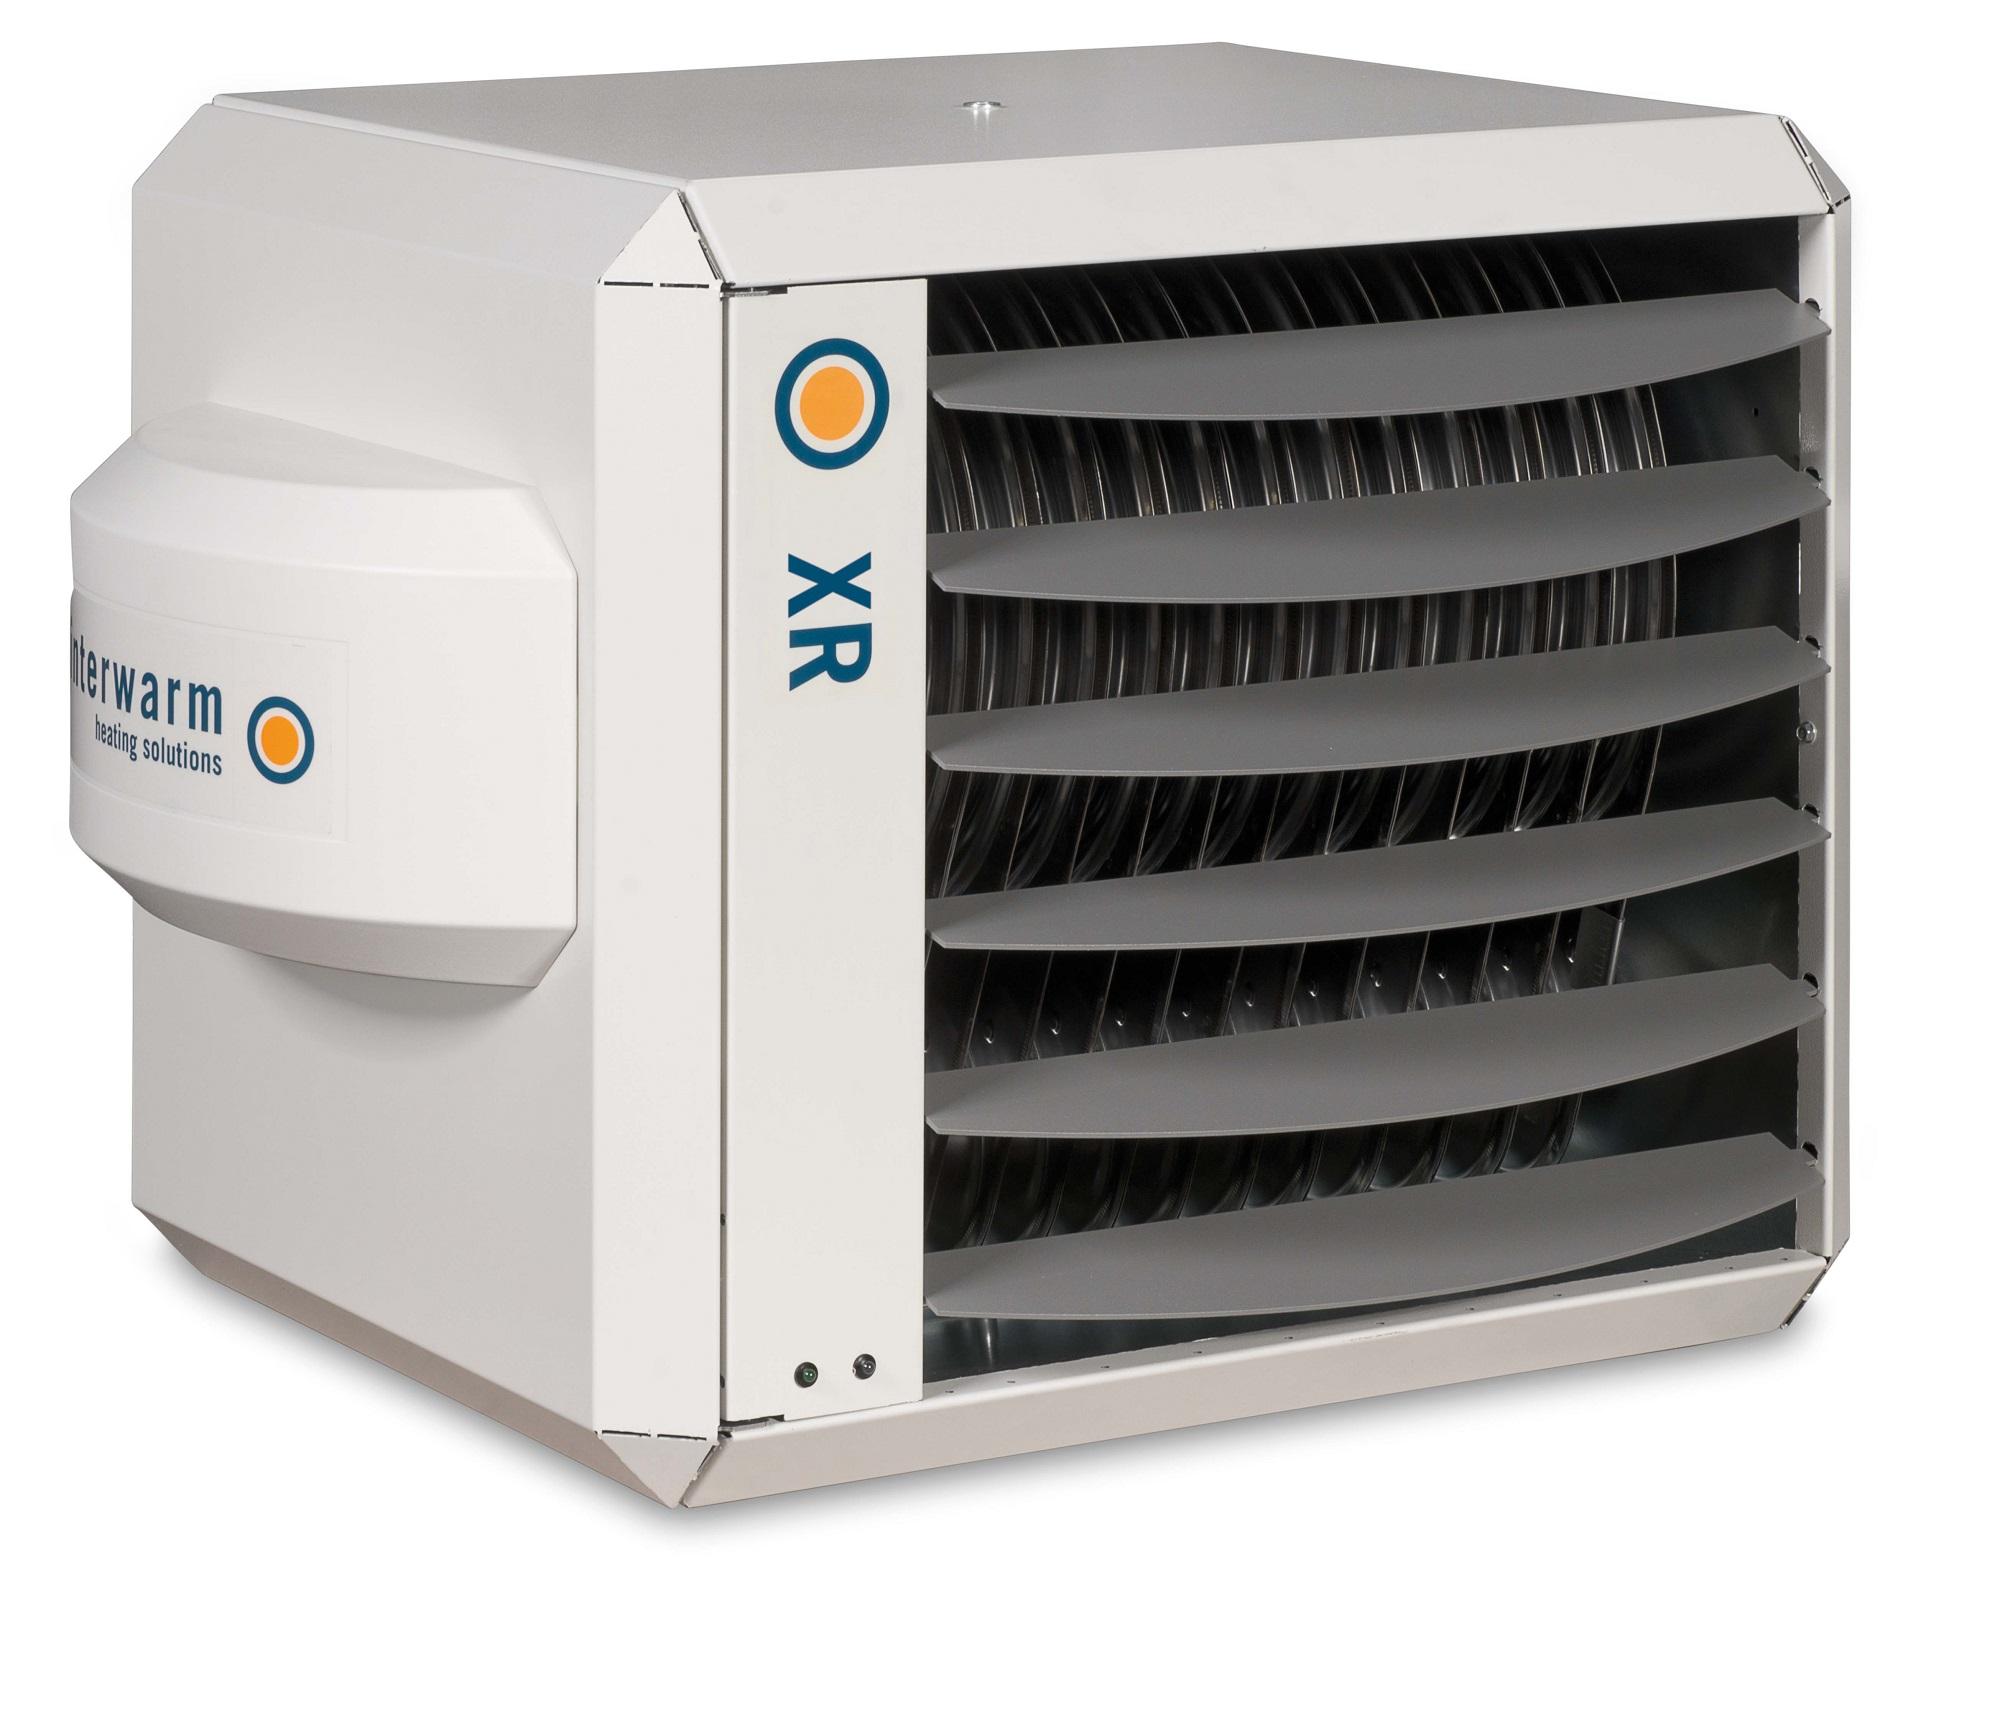 XR20 Verbeterd rendement toestel 20kW